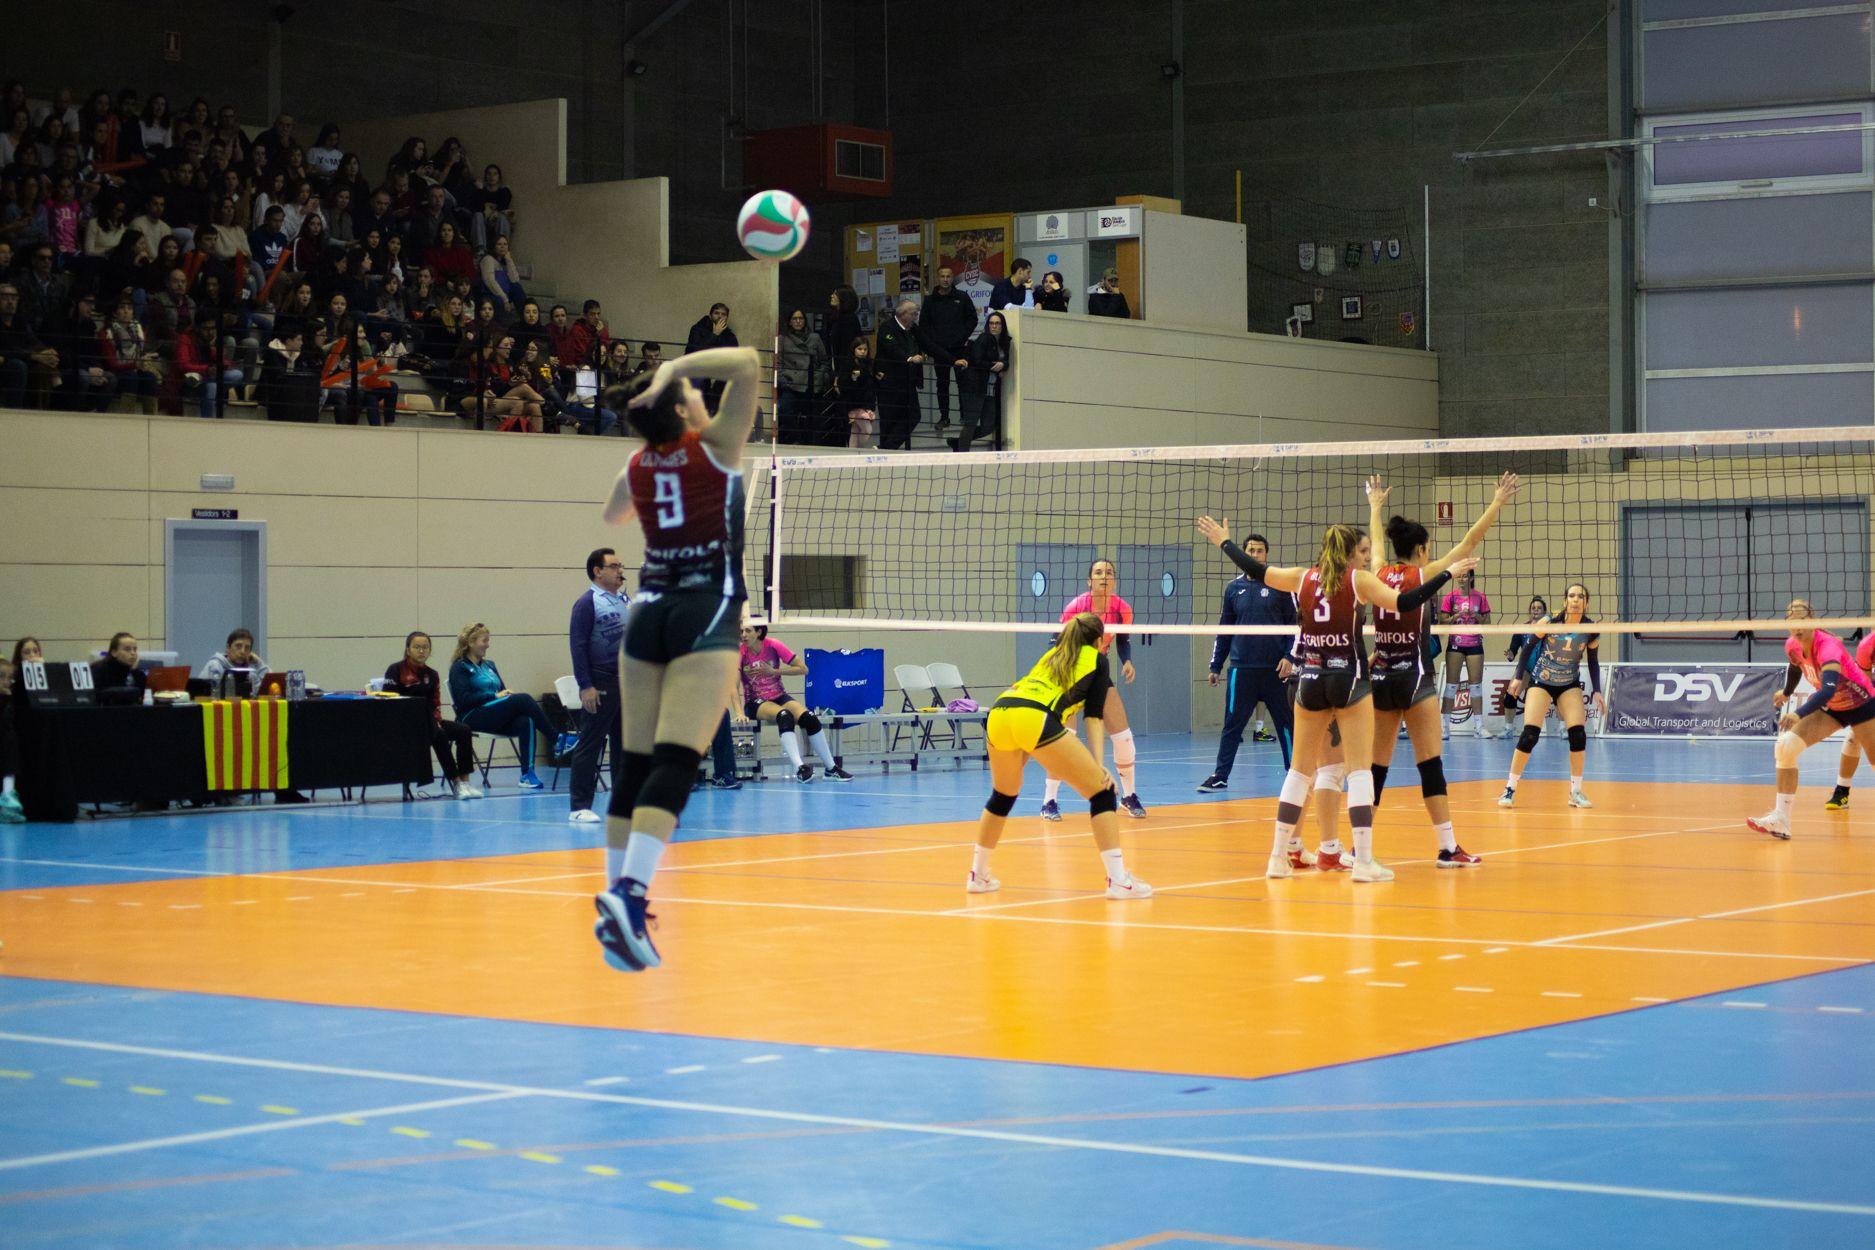 voDSV Club Voleibol Sant Cugat - AD Algar Surmenor. Foto: Adrián Gómez